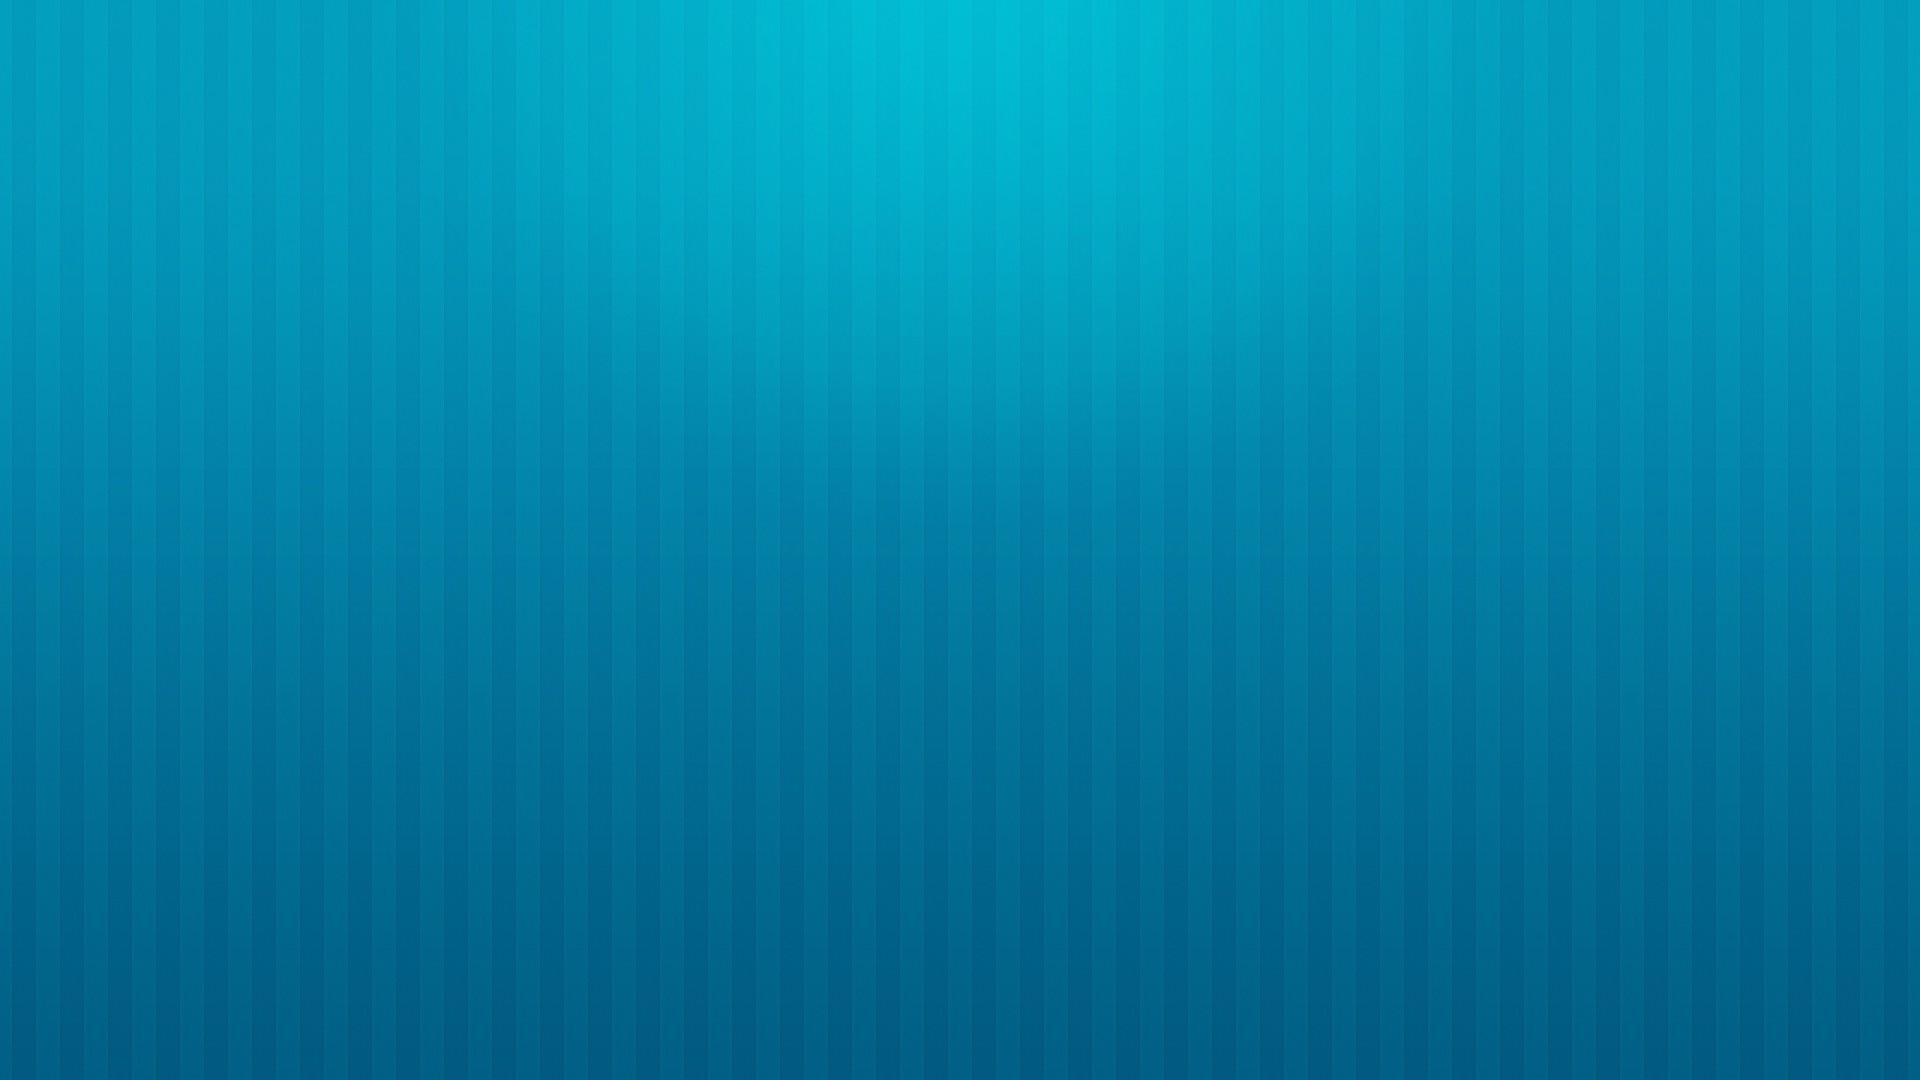 Plain Blue hd wallpaper download